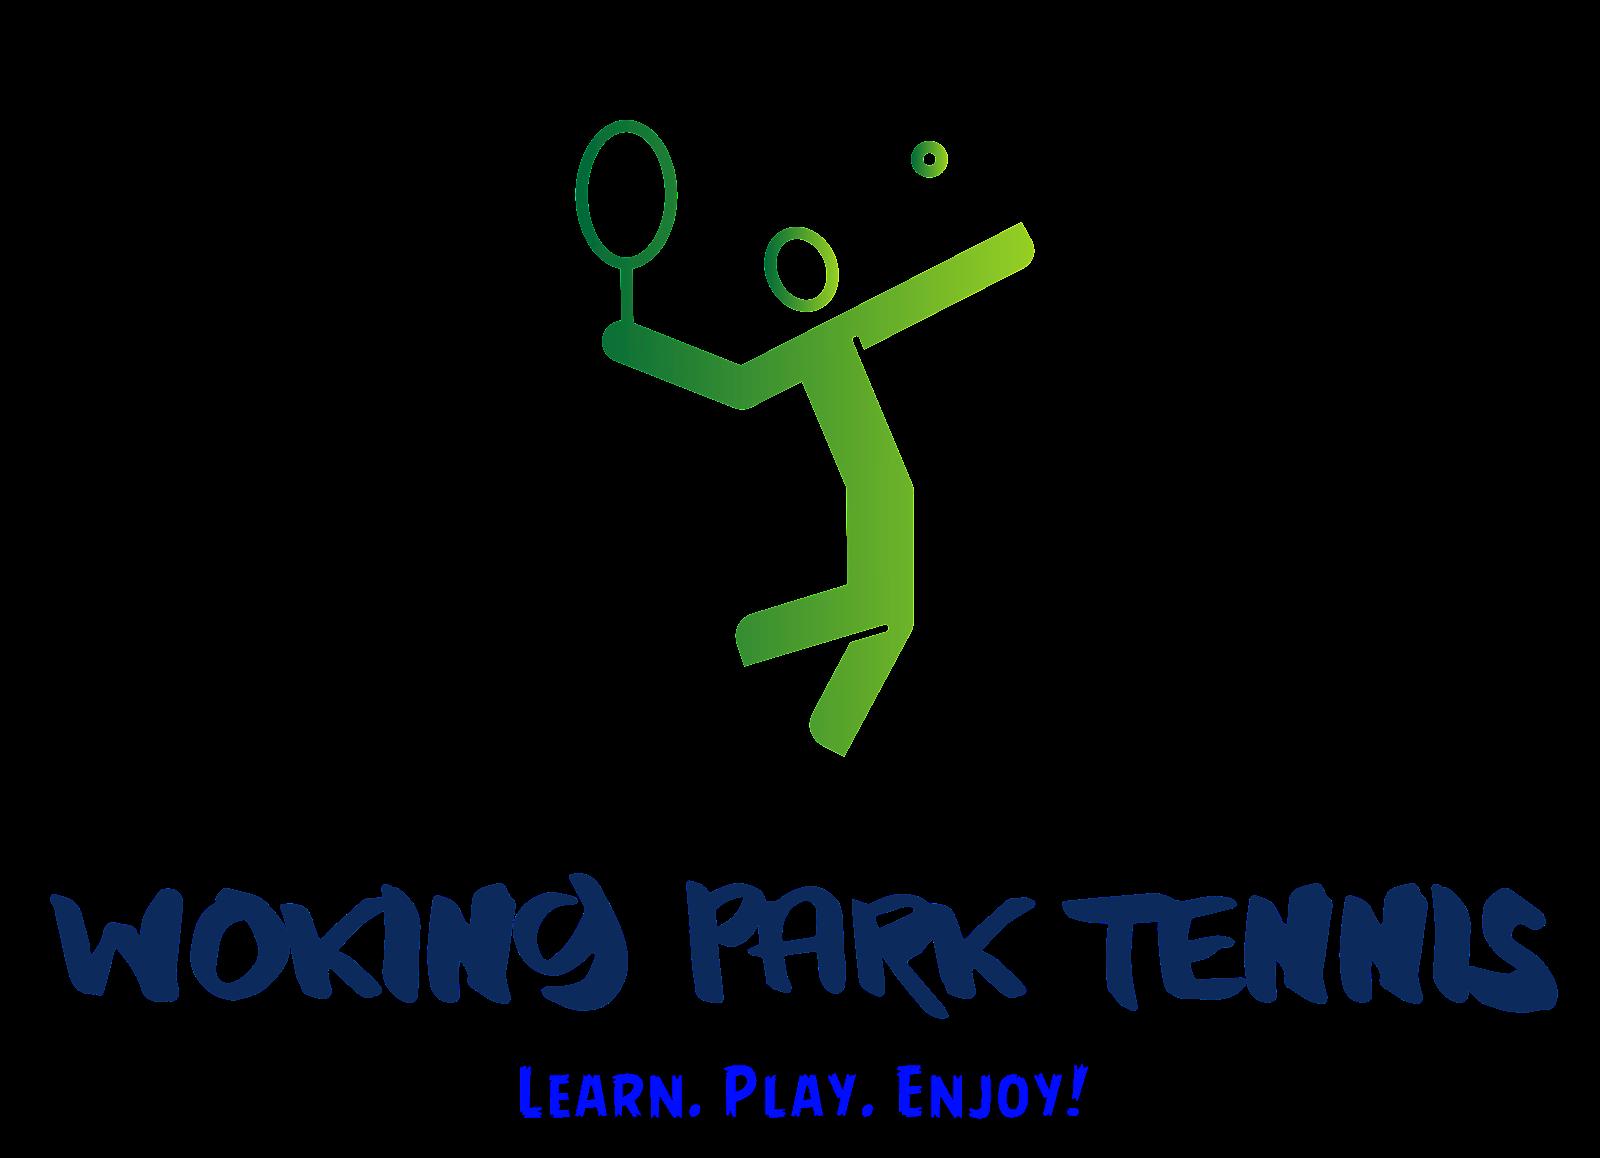 Woking Park Tennis